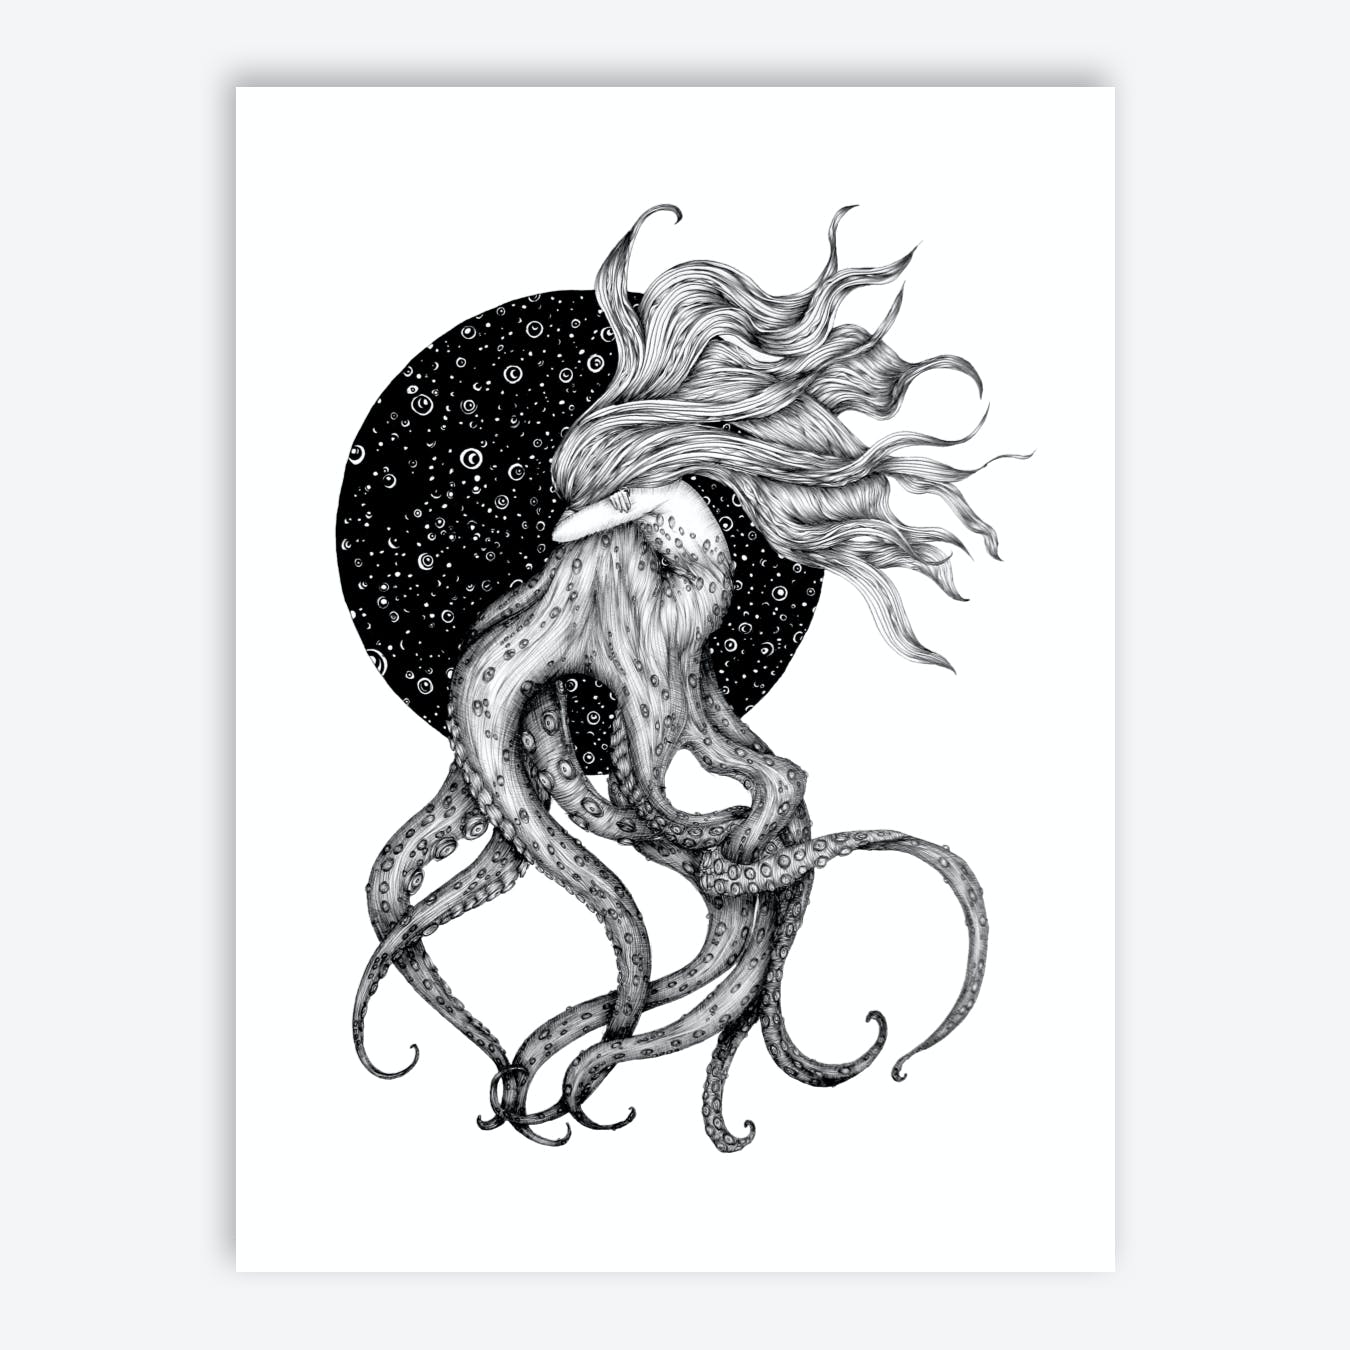 Young Ursula Print